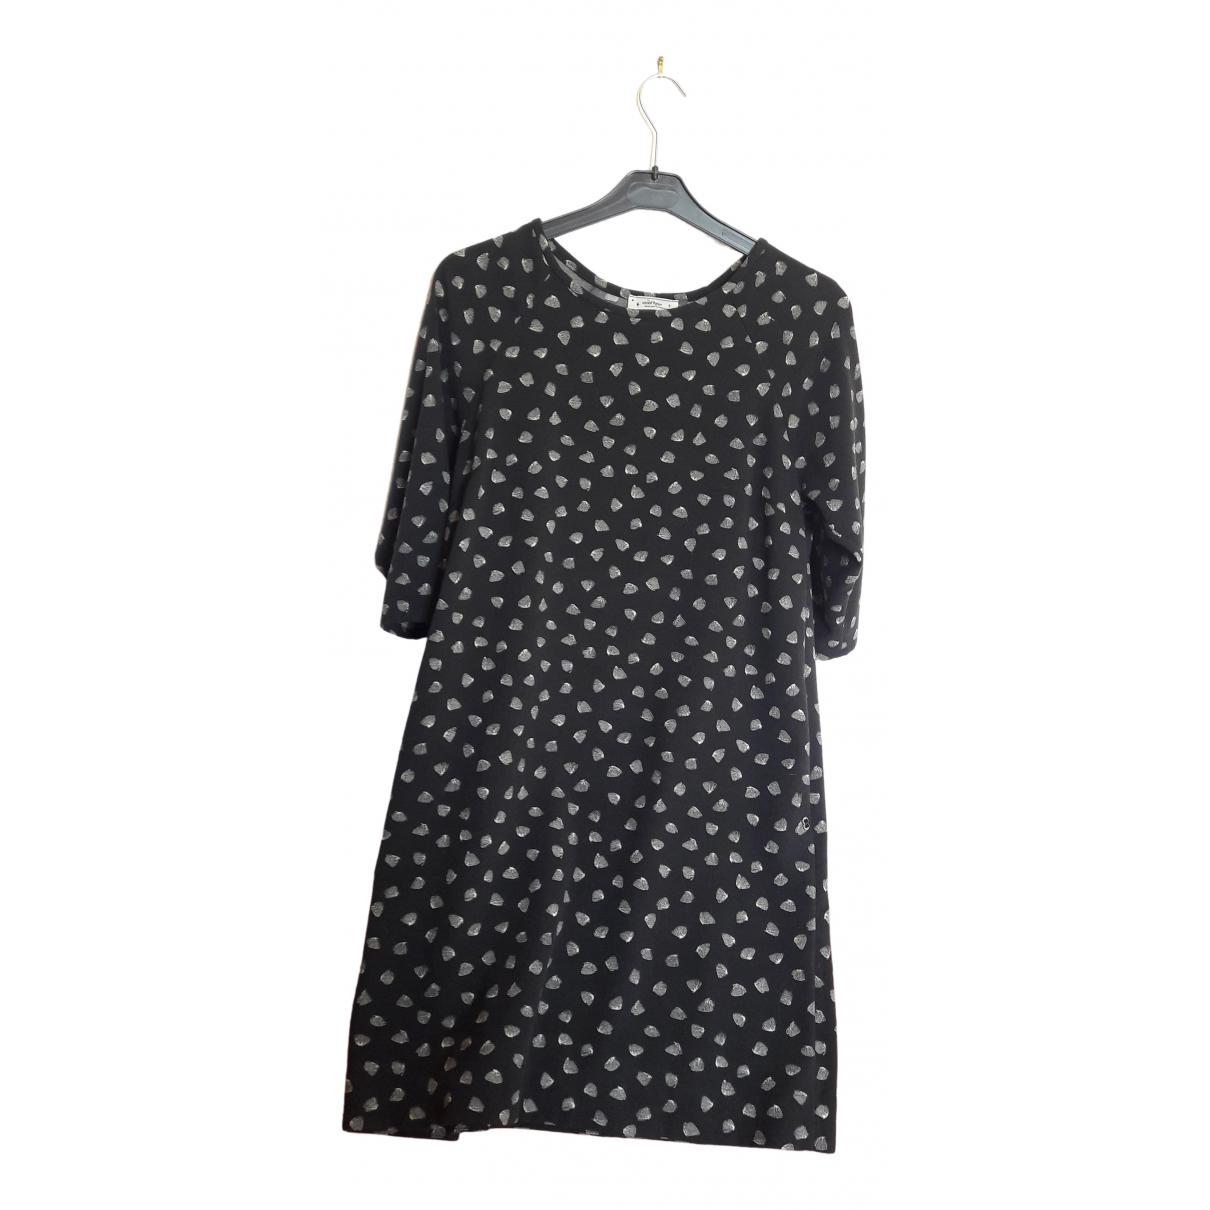 Ottod'ame \N Black Cotton dress for Women 40 FR